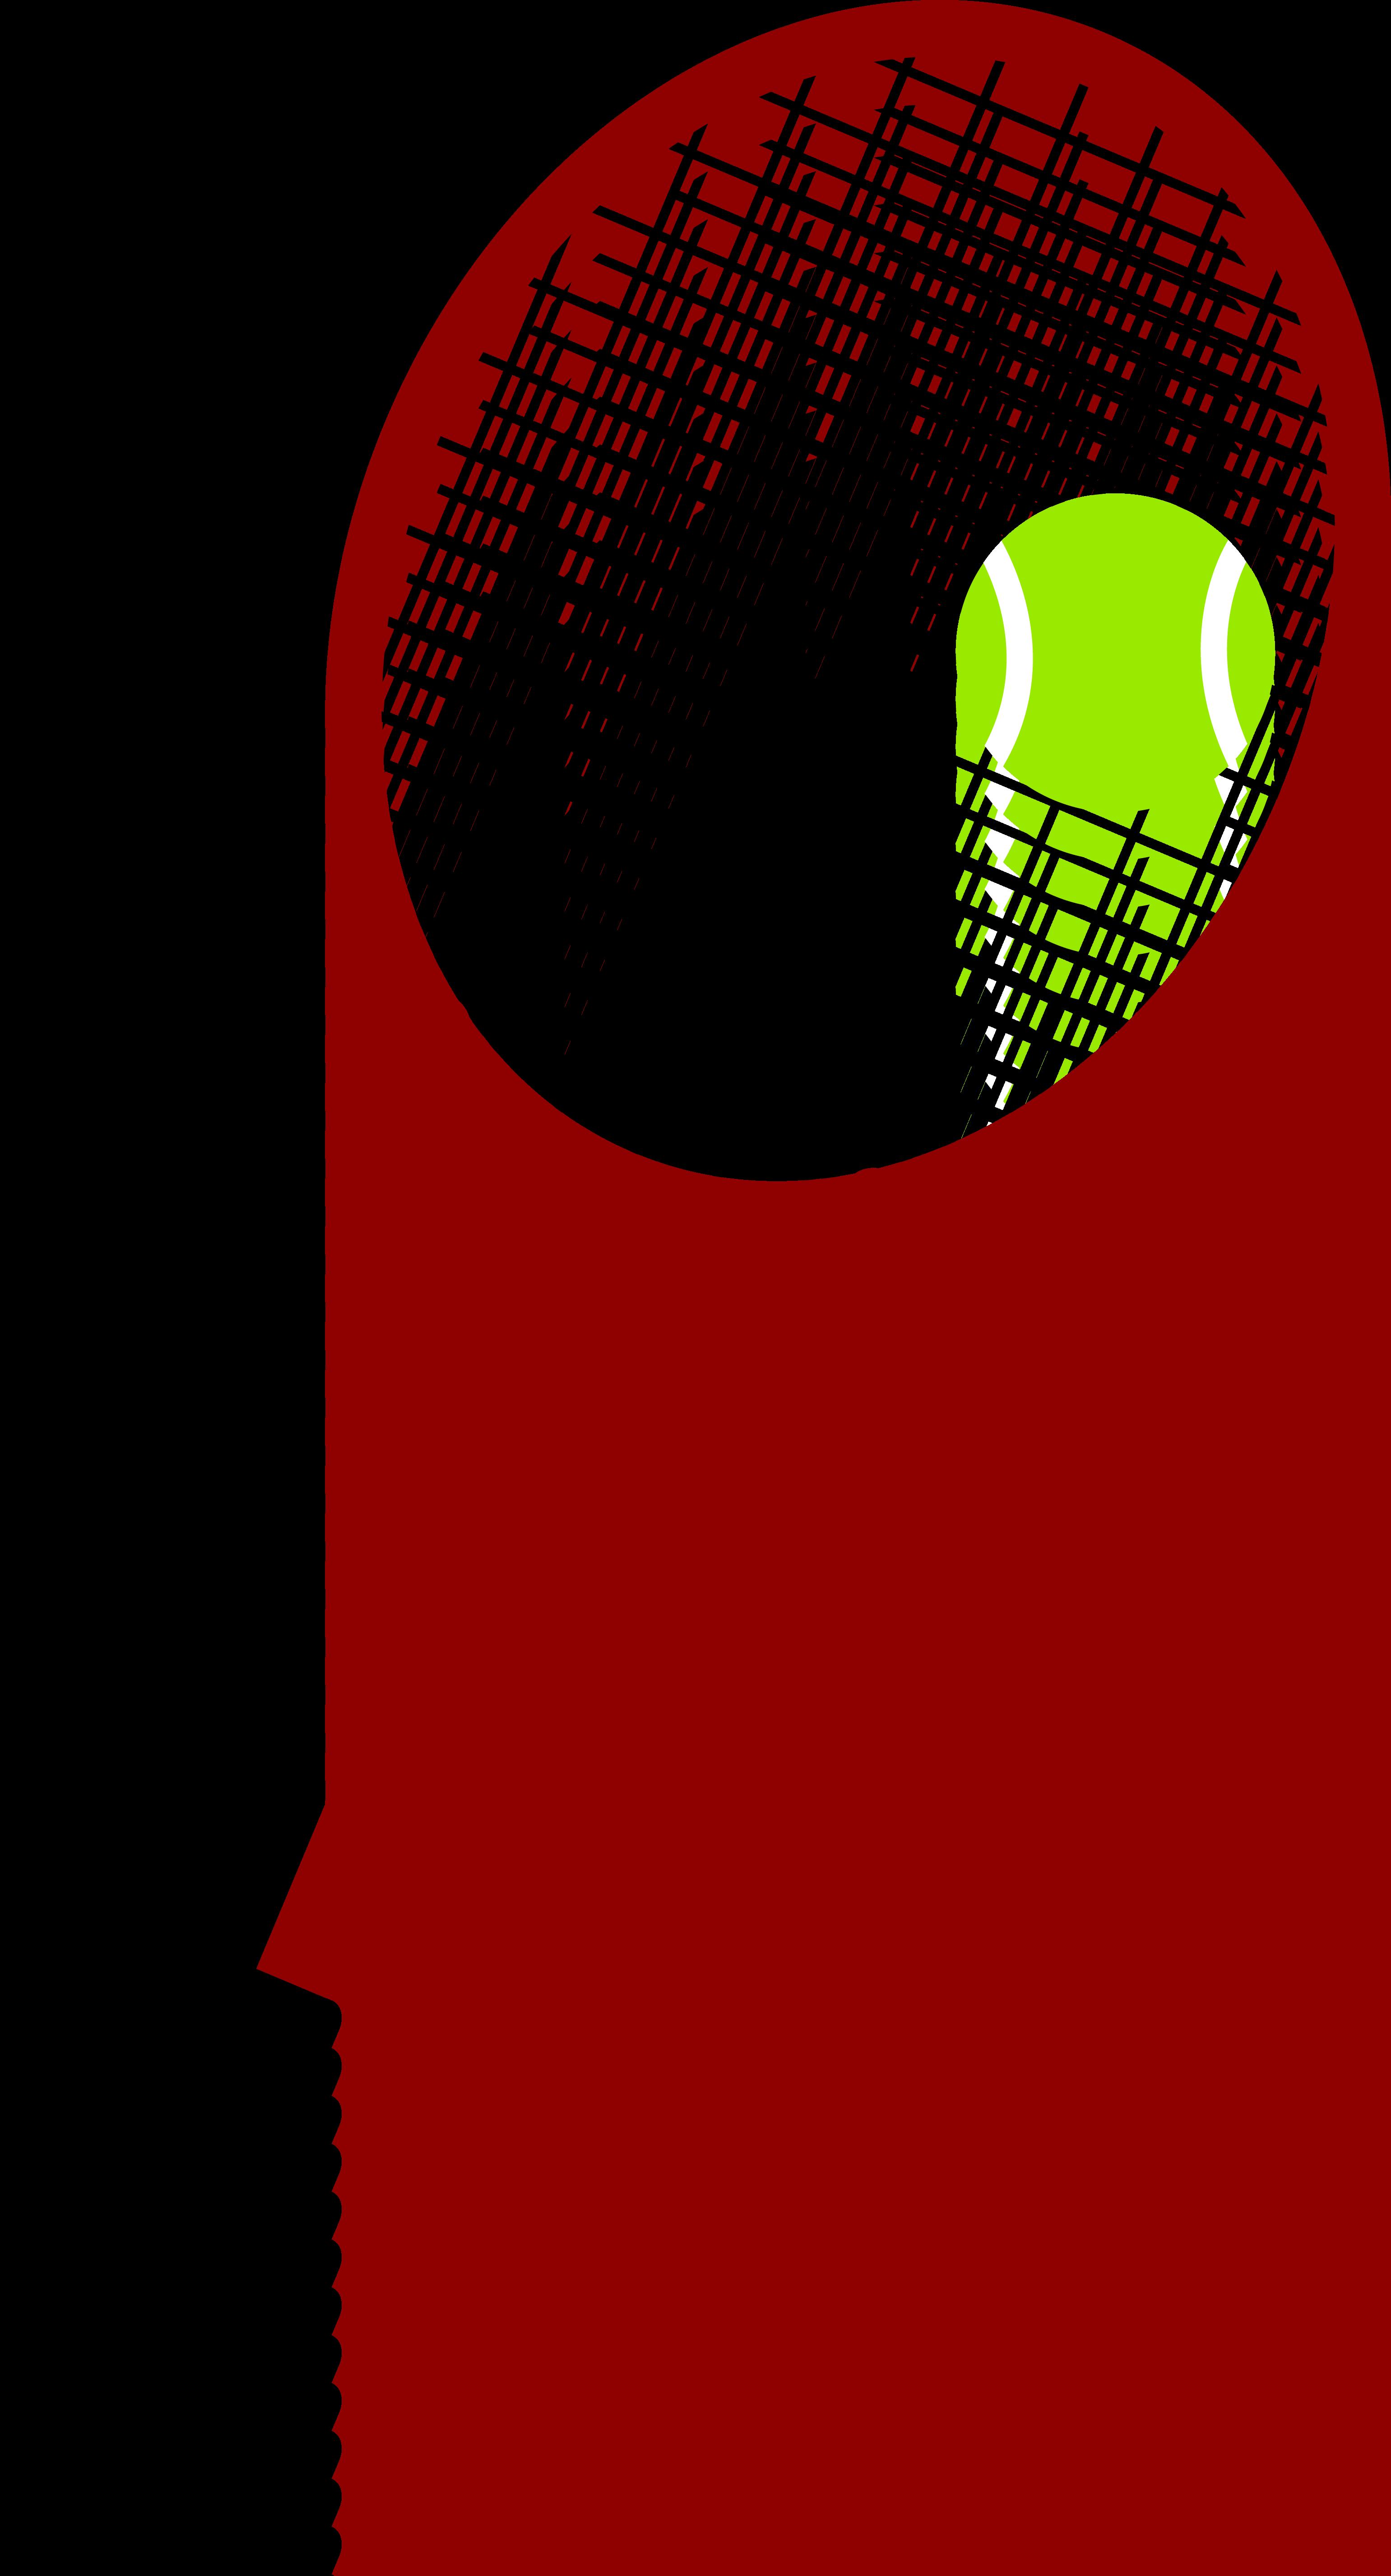 Pink clipart tennis racket Clipart Panda Images Clipart Tennis